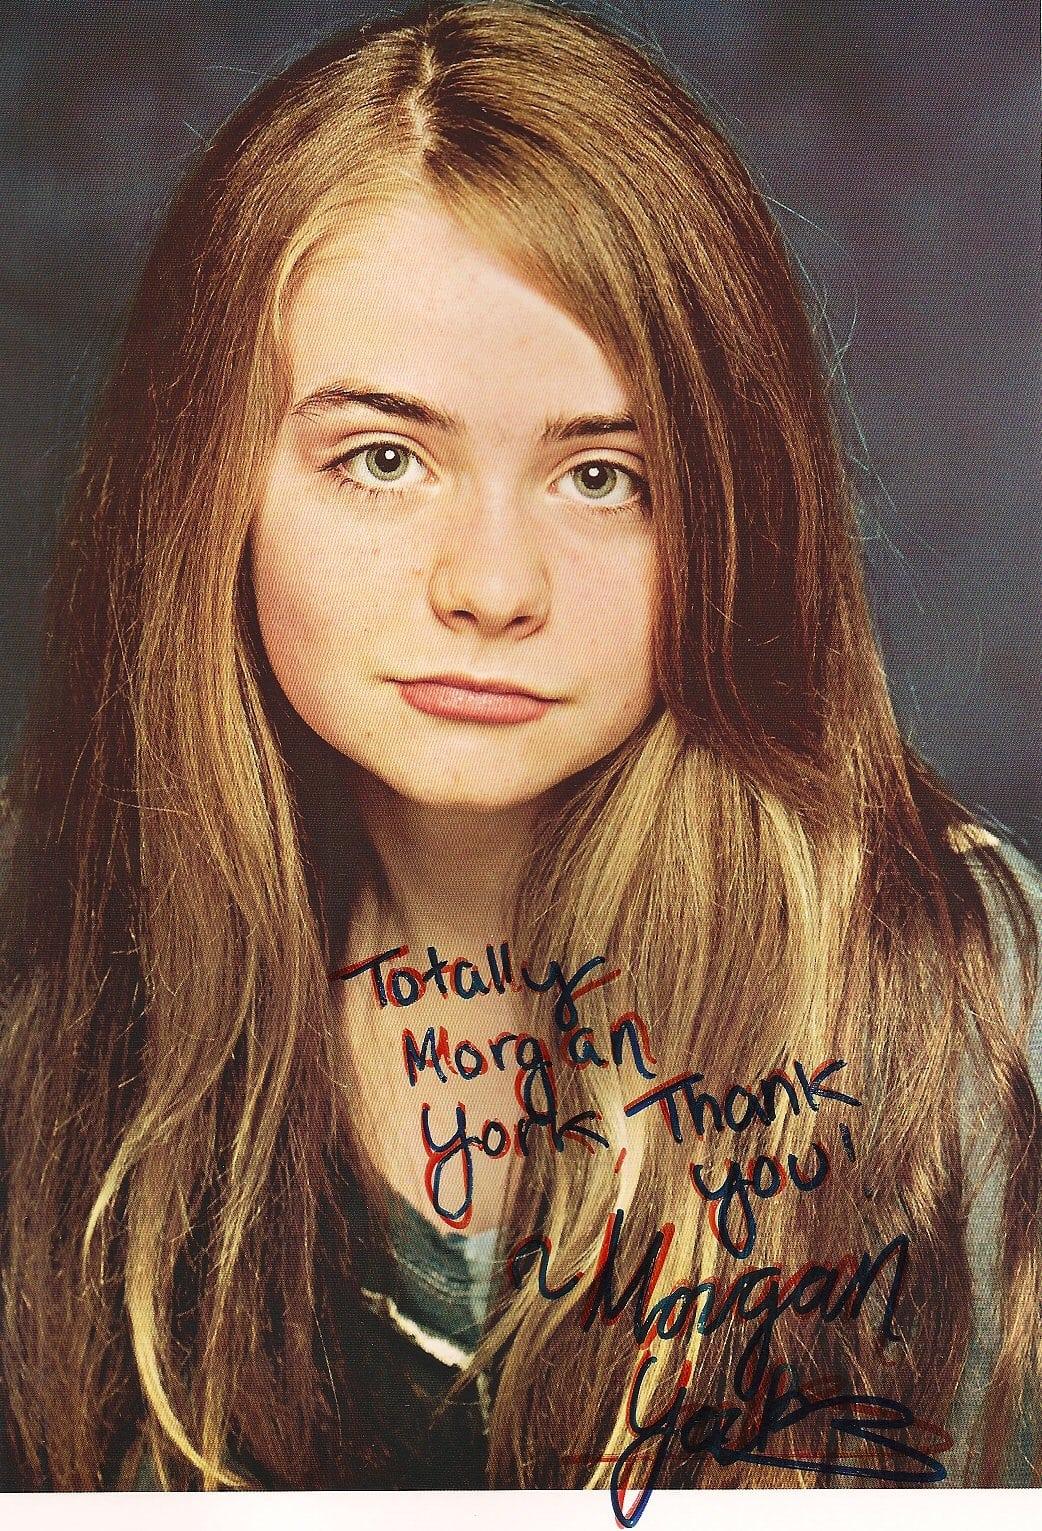 Picture of Morgan York